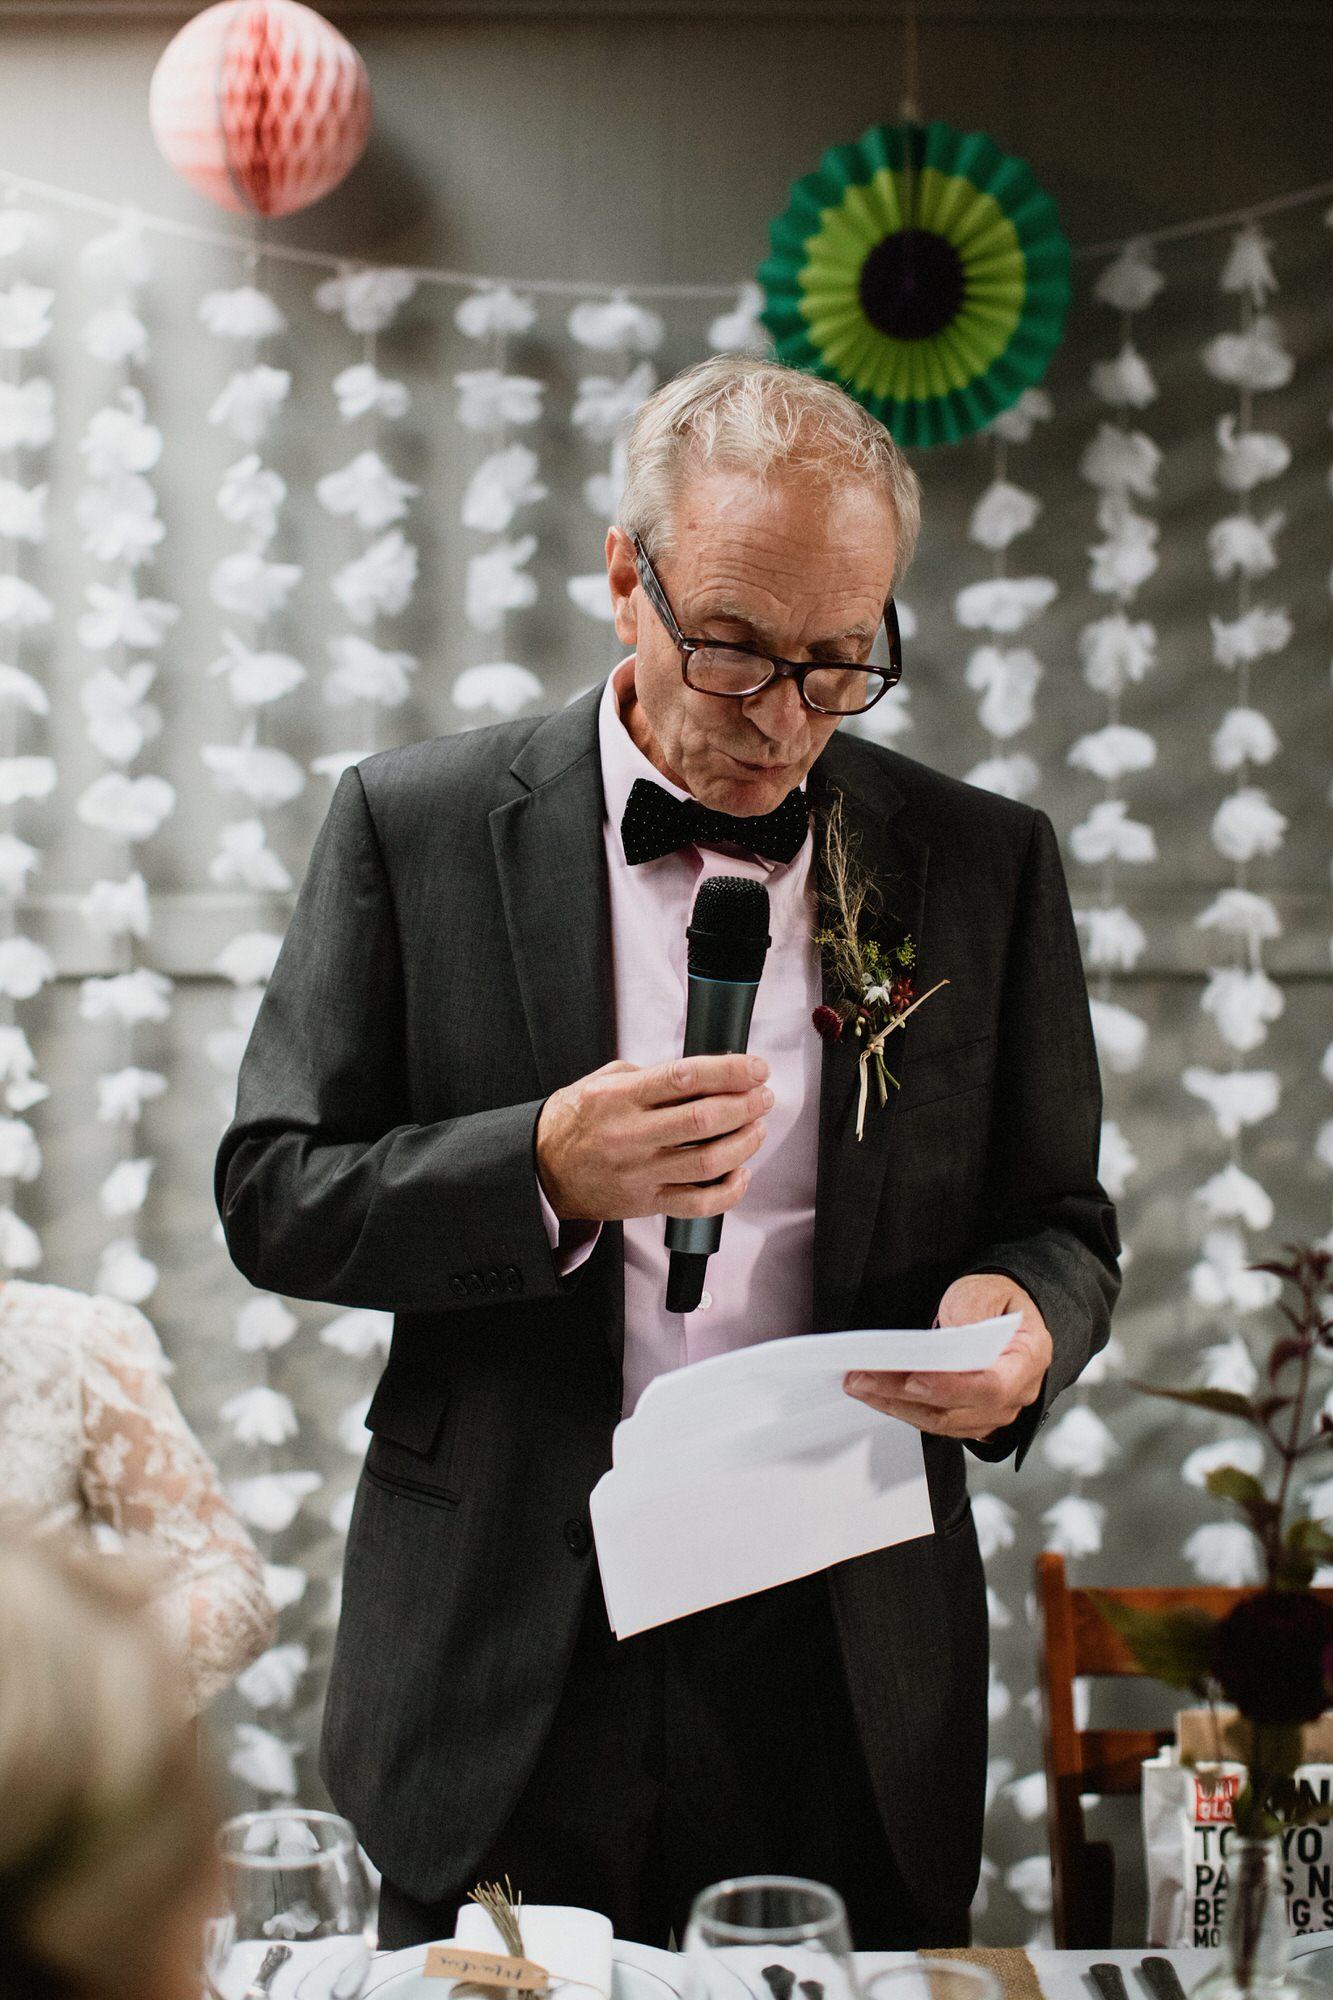 049 TIN SHED KNOCKRAICH WEDDING AUTUMN ZOE ALEXANDRA PHOTOGRAPHY